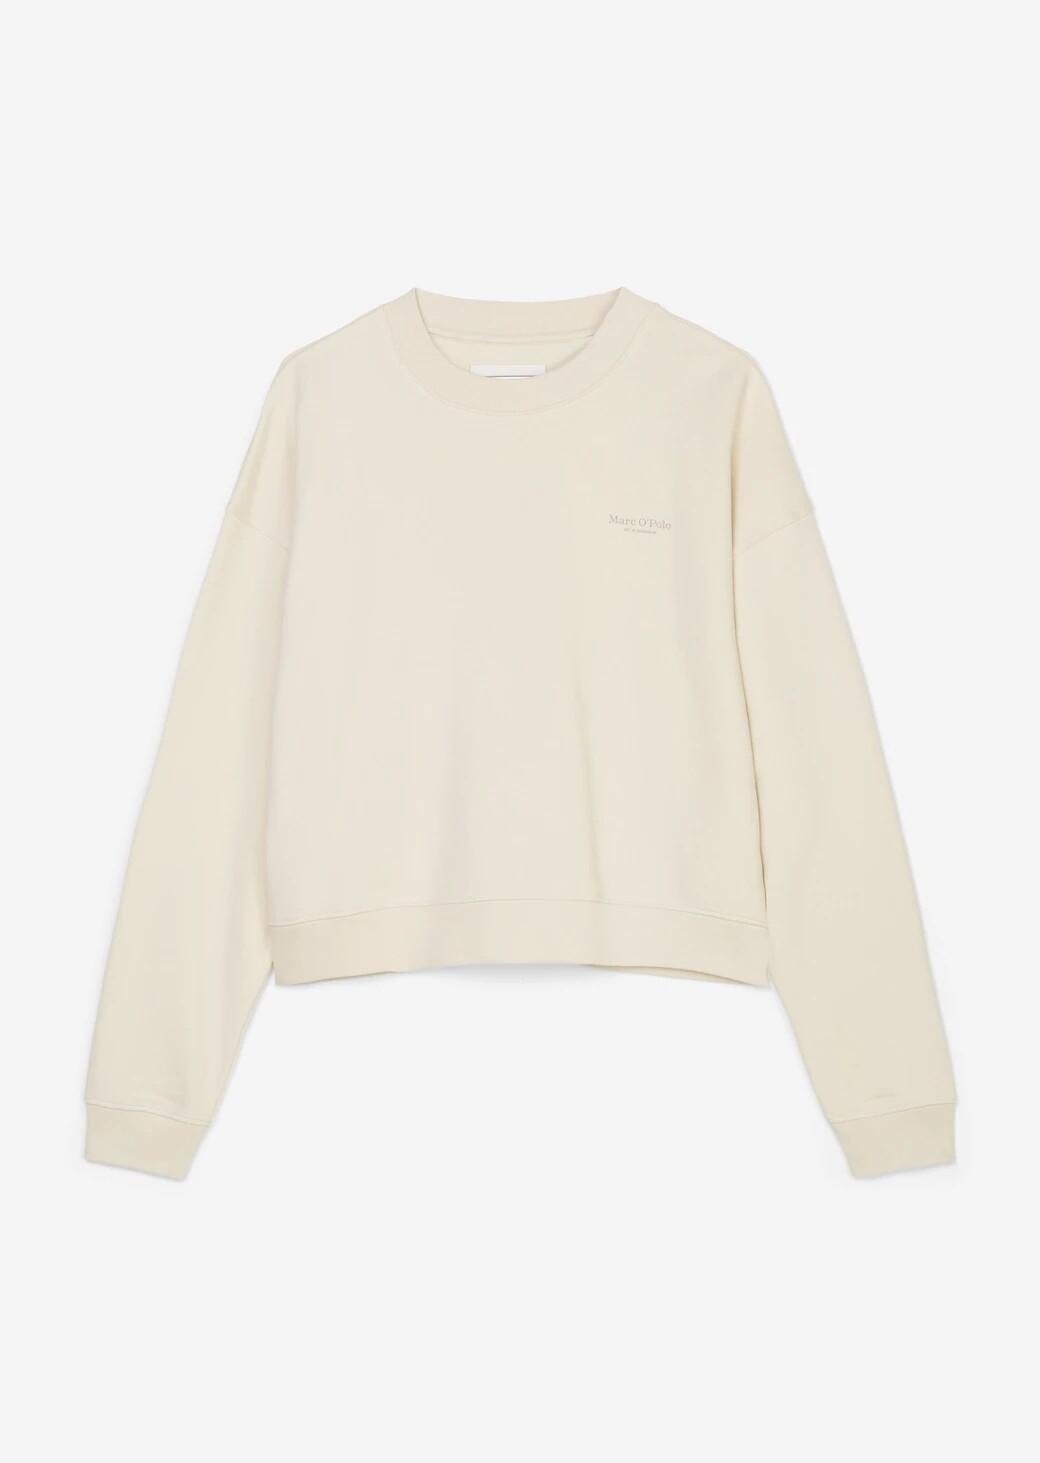 Chalky Sand Sweatshirt